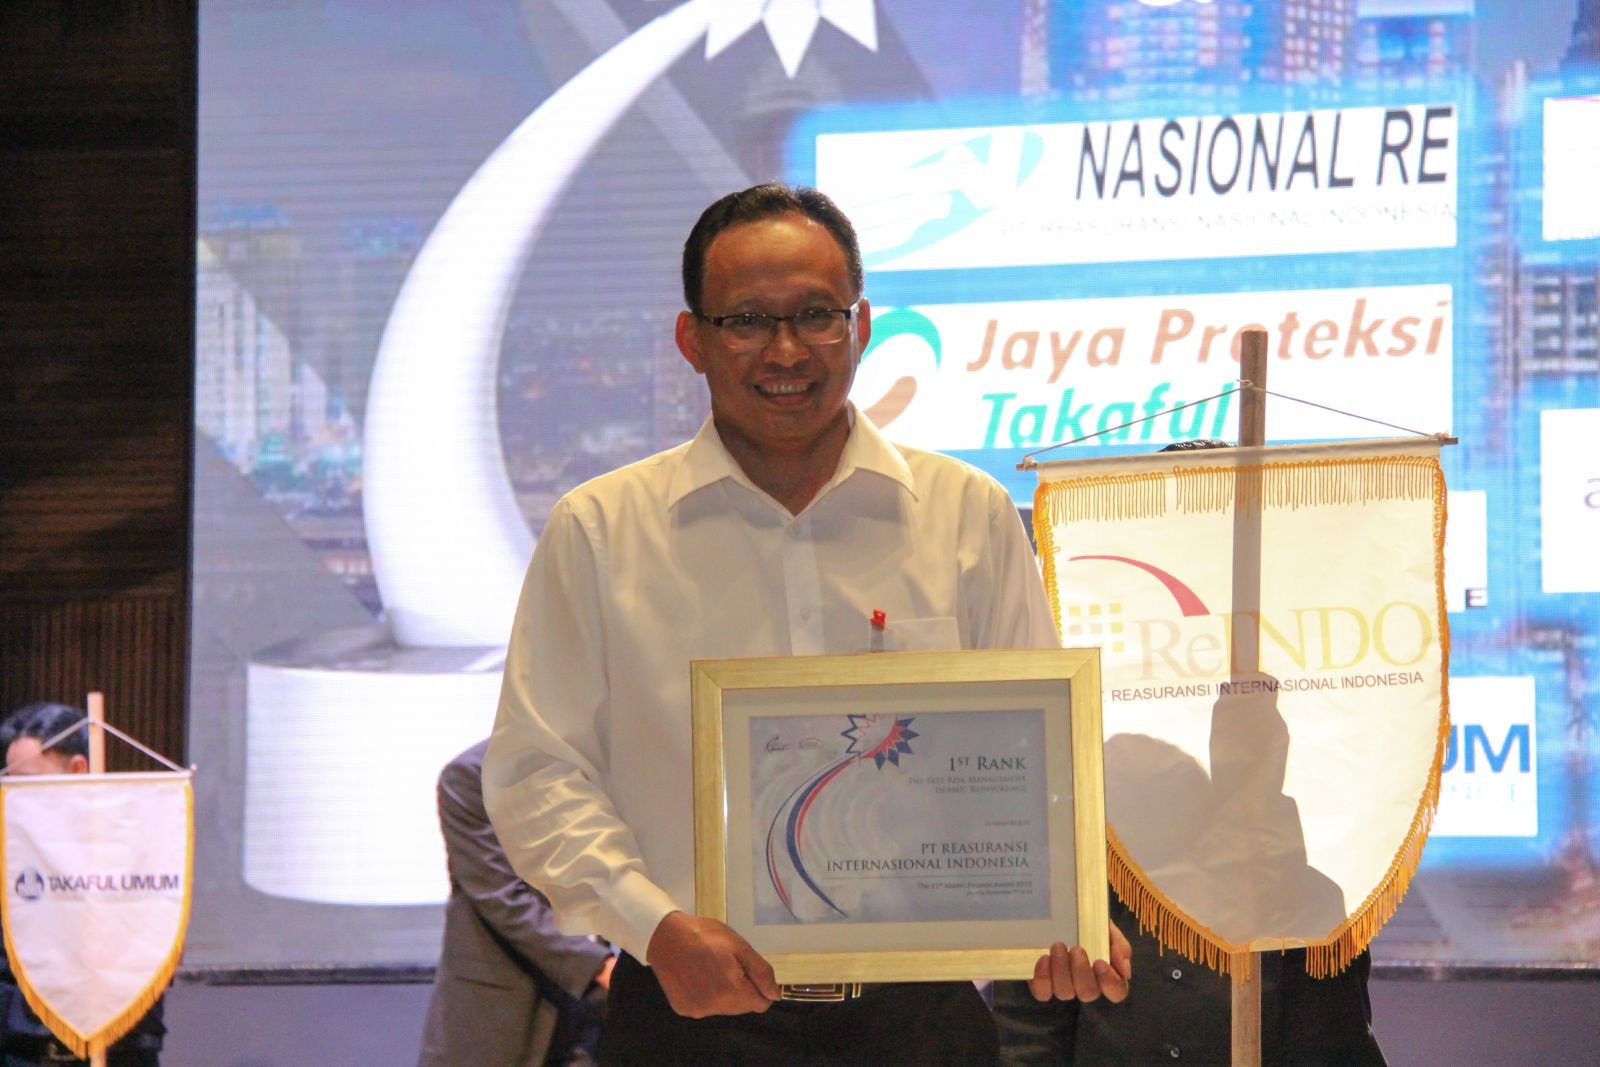 ReINDO Menerima Penghargaan 1 st Rank The Best Islamic Reinsurance dan 1st Rank The Best Risk Management Islamic Reinsurance